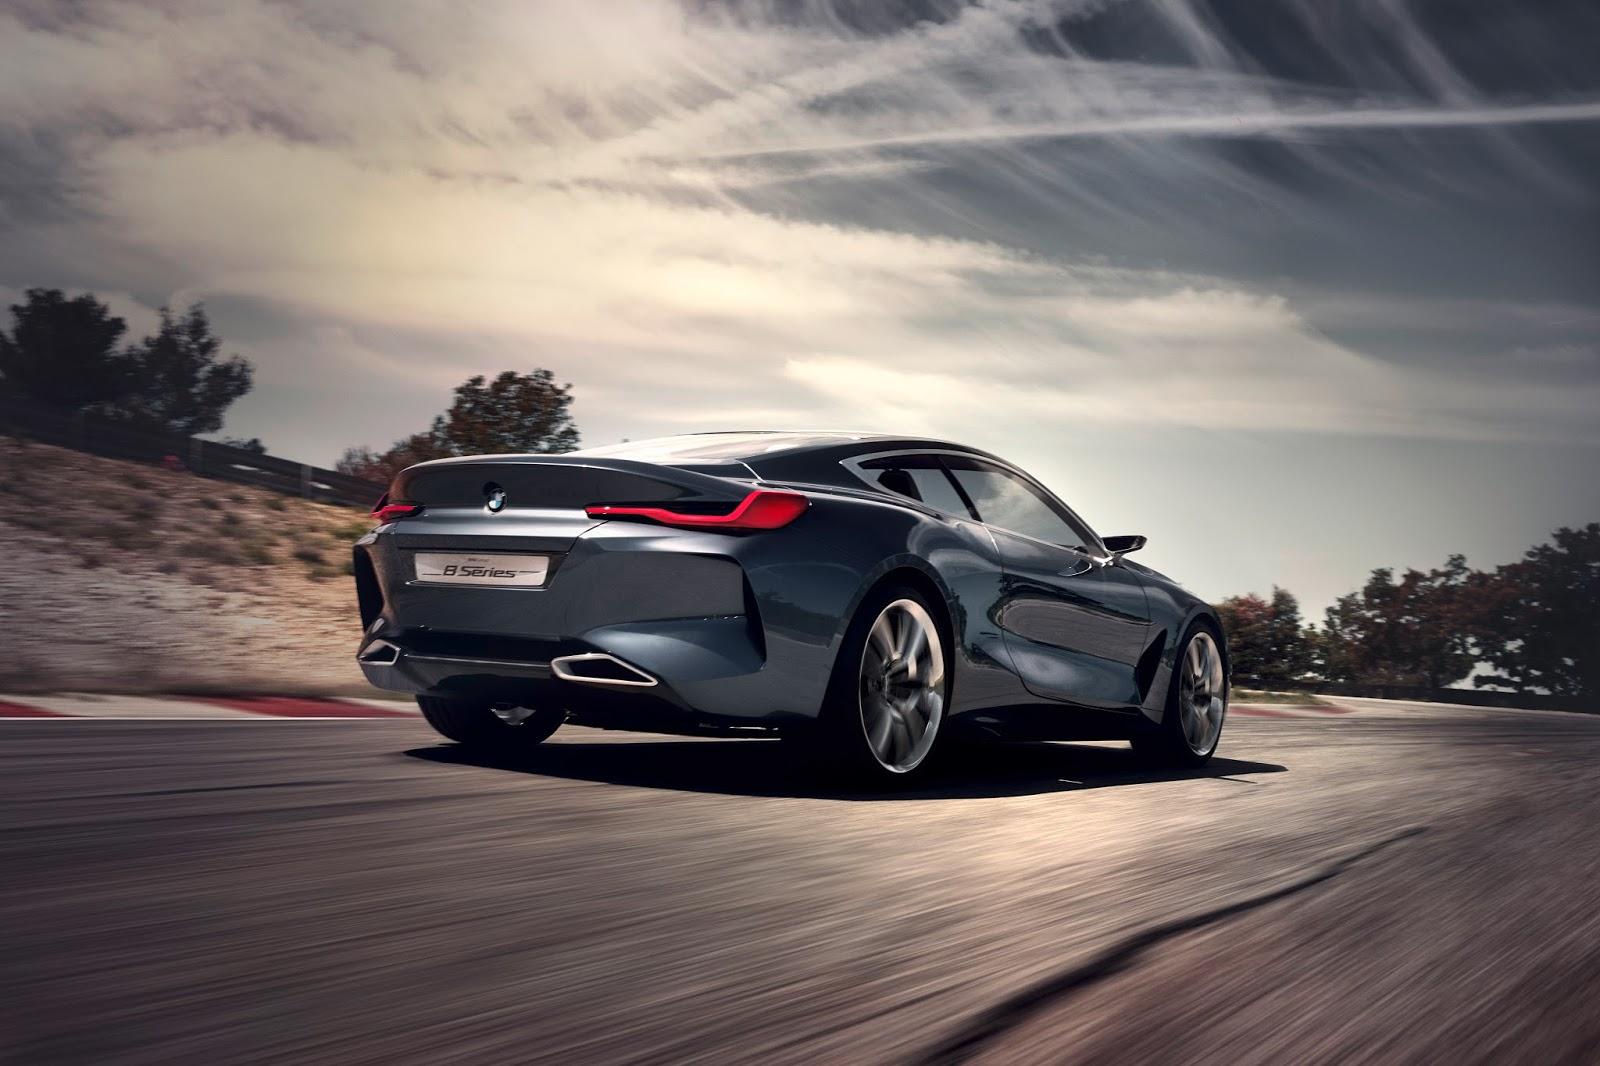 P90261152 highRes bmw concept 8 series Η BMW Σειρά 8 Coupe είναι η πεμπτουσία των μελλοντικών σπορ αυτοκινήτων BMW, BMW 8, BMW Concept, BMW Concept 8 Series, COUPE, dream car